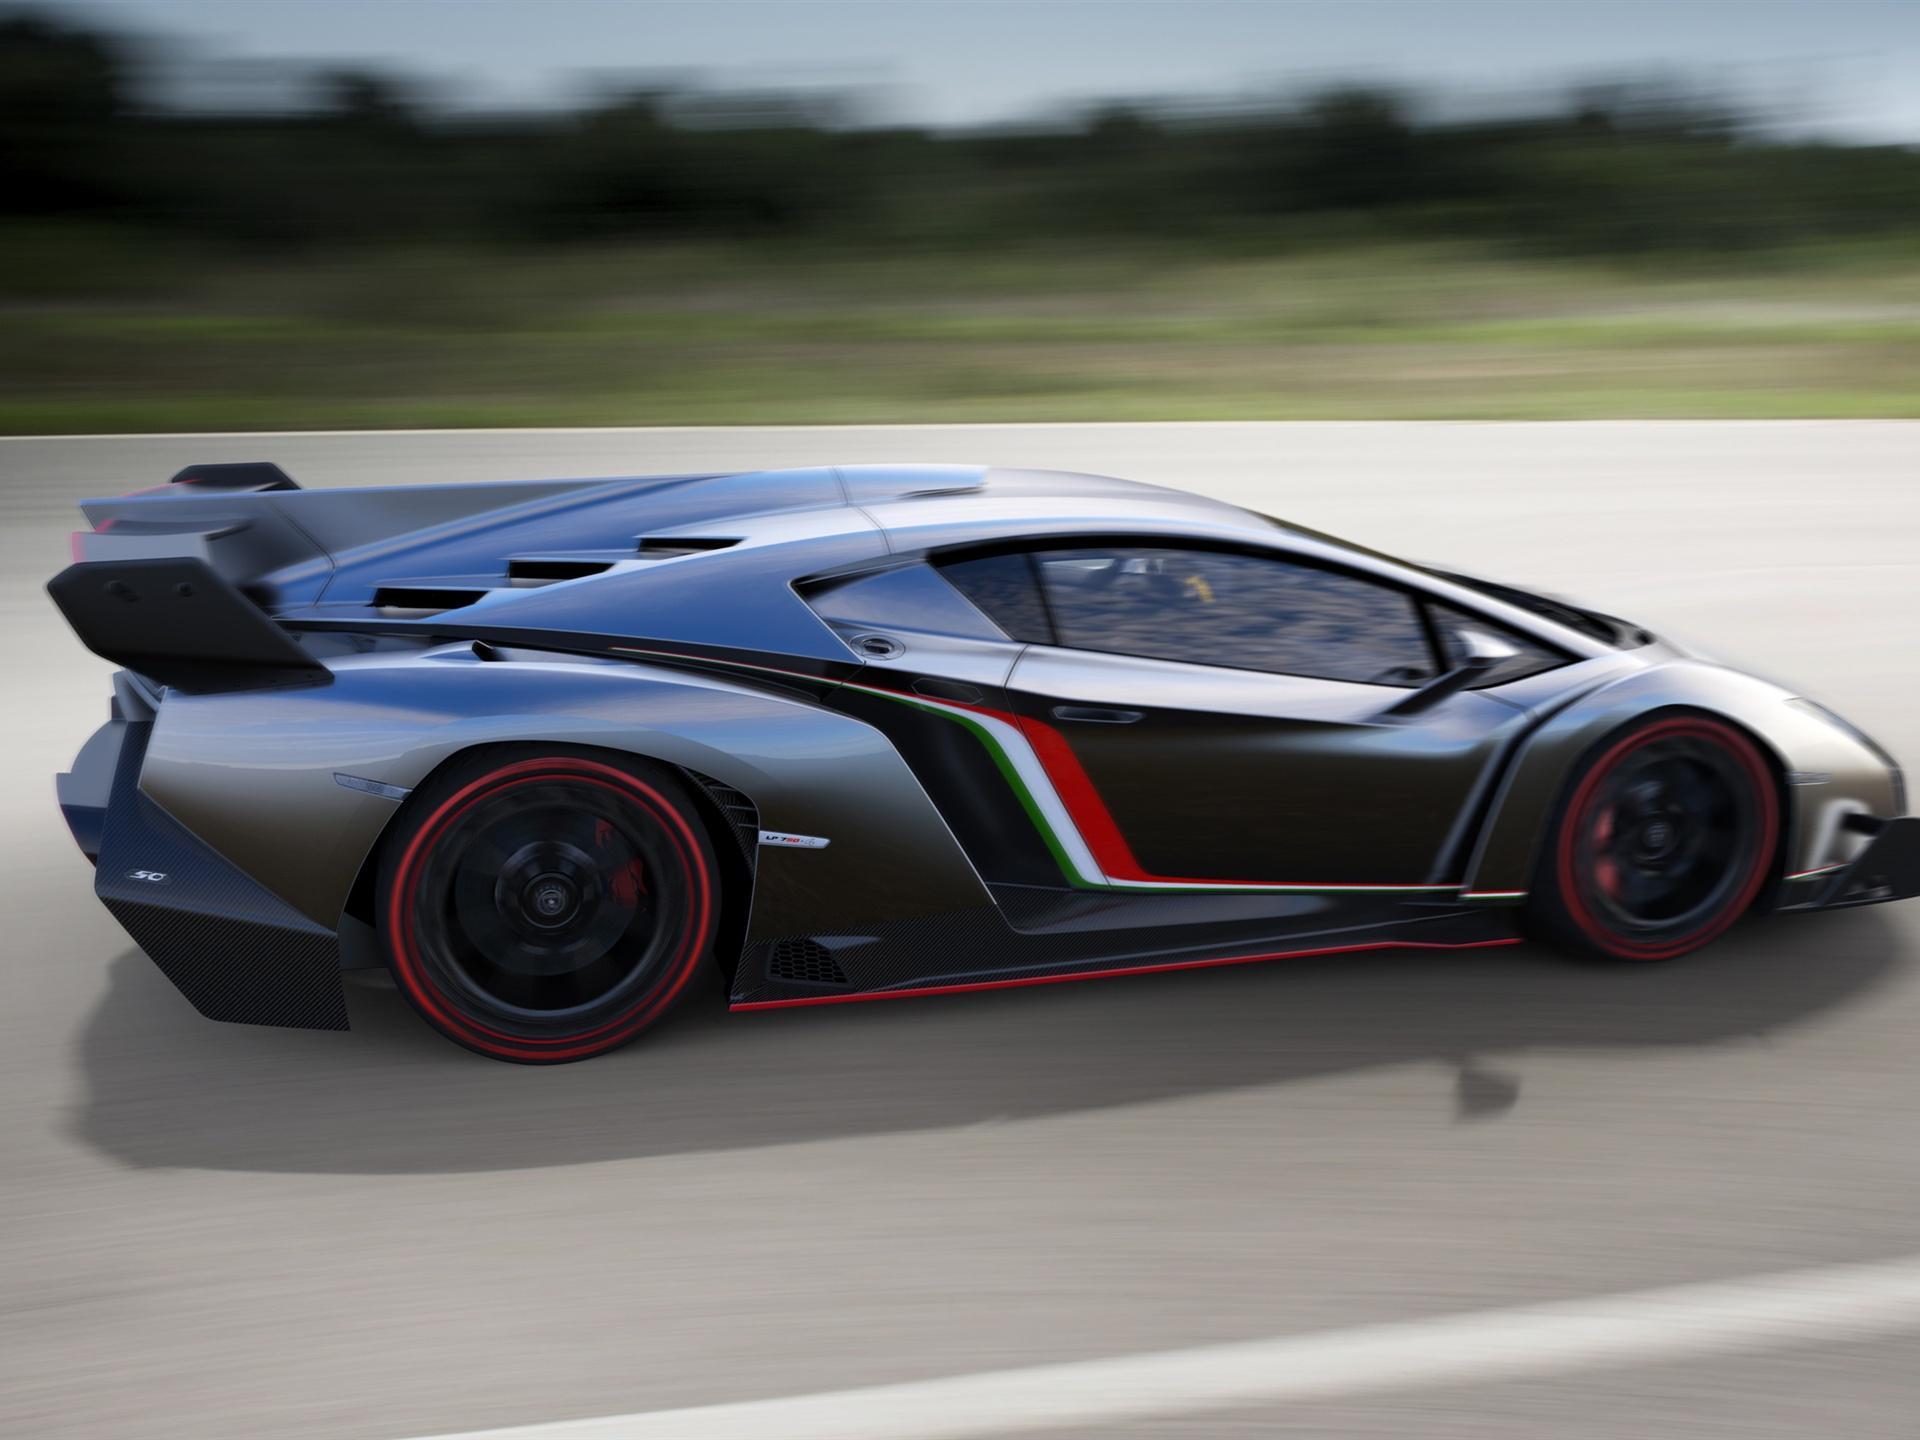 ĸ�载壁纸 1920x1440 2013年的超级跑车兰博基尼veneno在高速运行 ơ�面背景